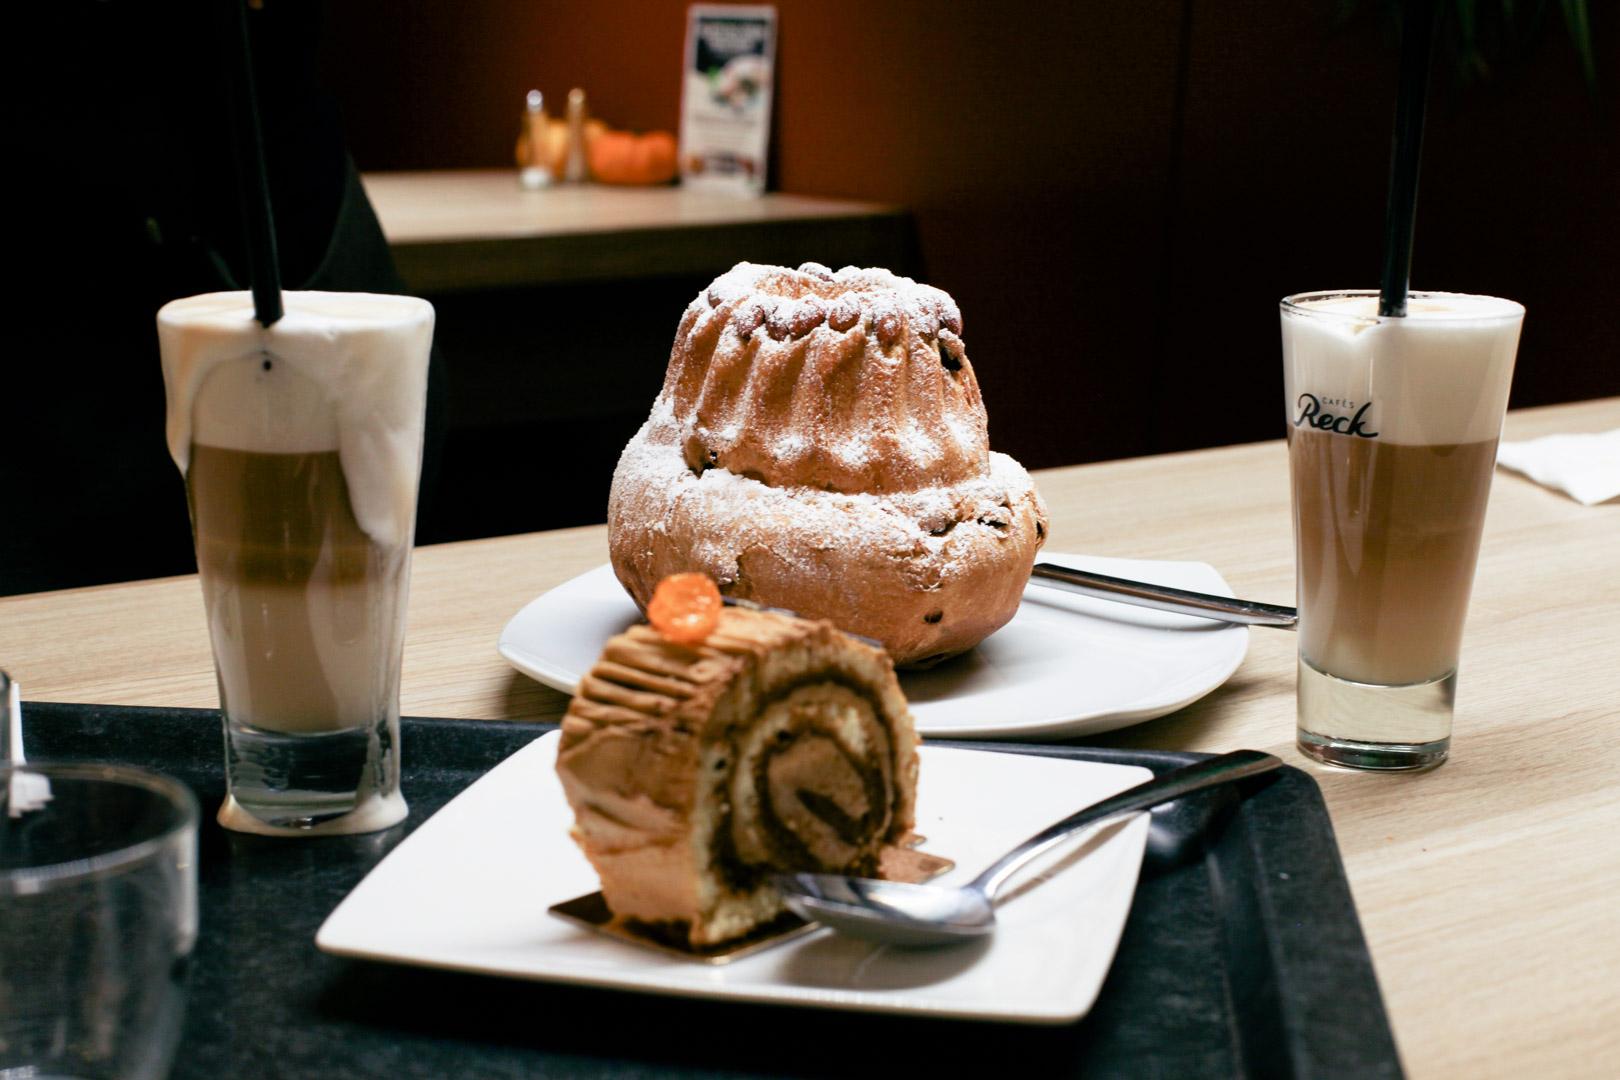 Guglhupf ring cake, a staple bakery here, like a upside-down muffin